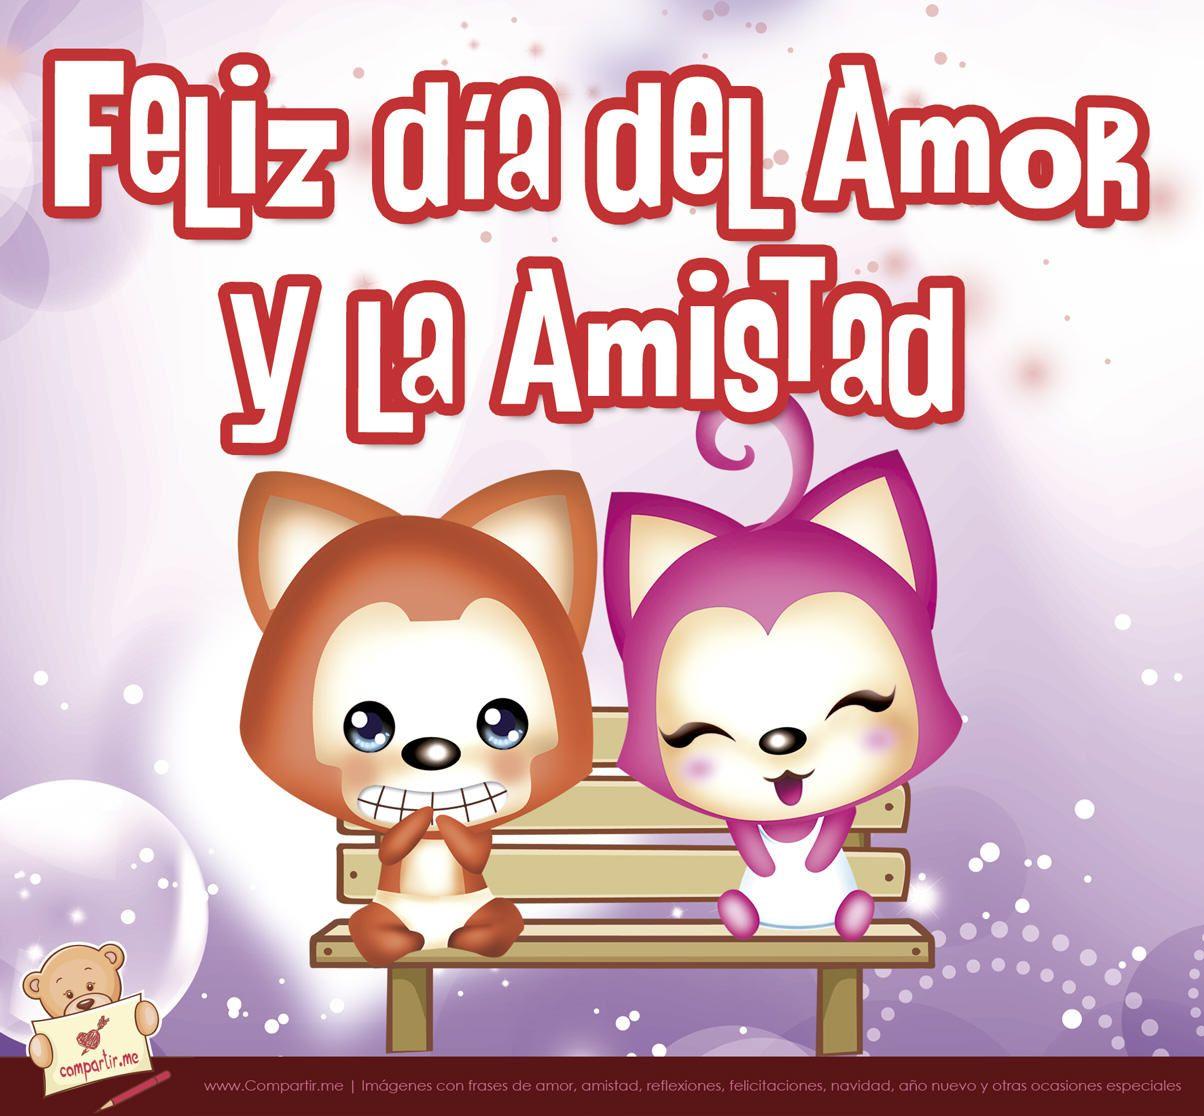 Dia Amor Y Amistad Caricatura Otras Imagenes Pinterest